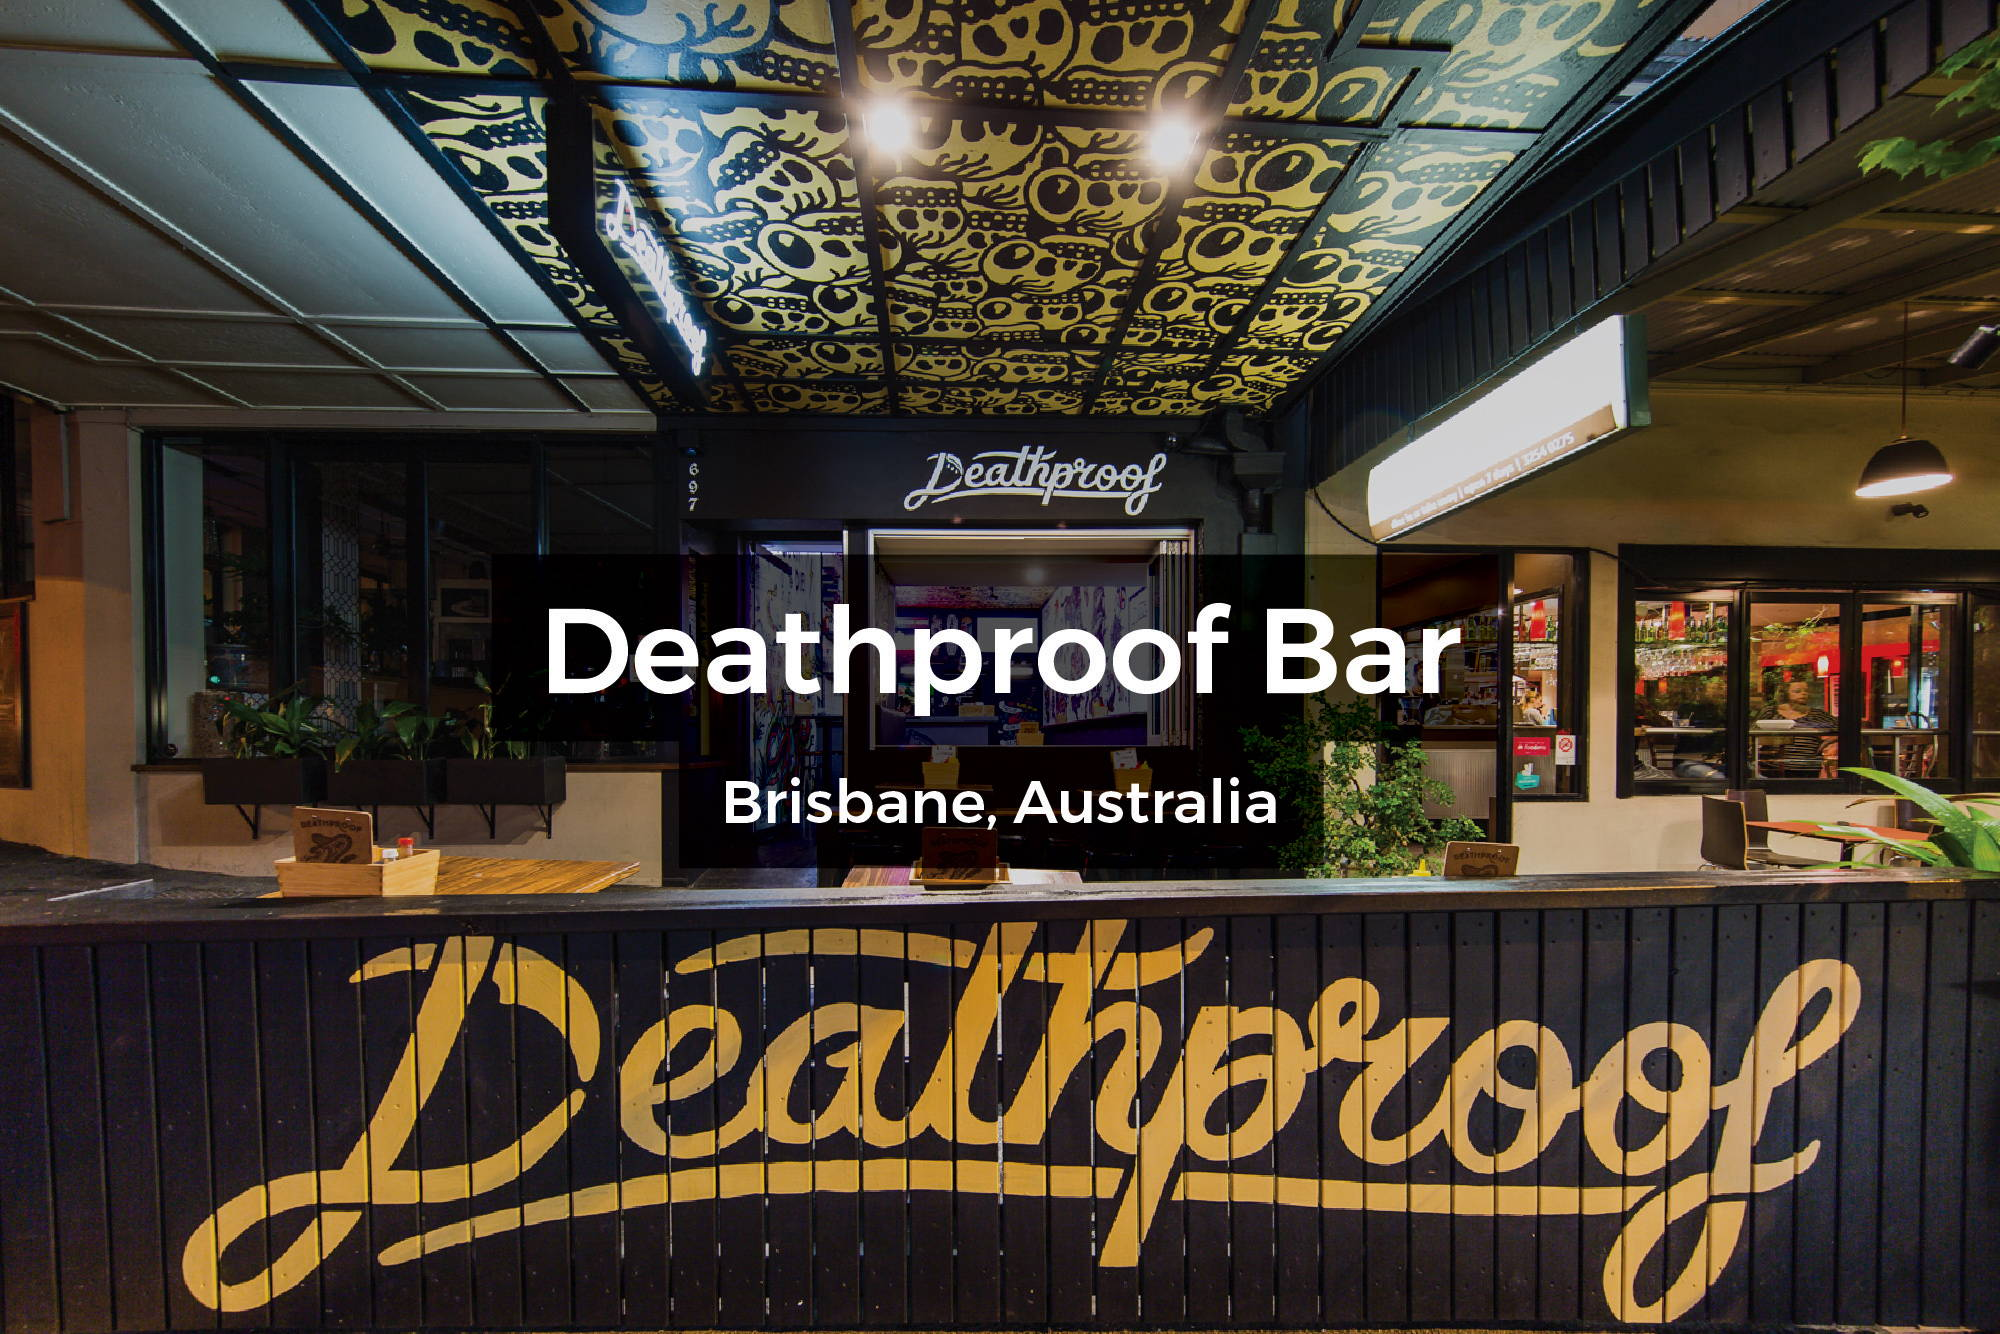 Deathproof Bar murals in Brisbane, Australia by Steen Jones